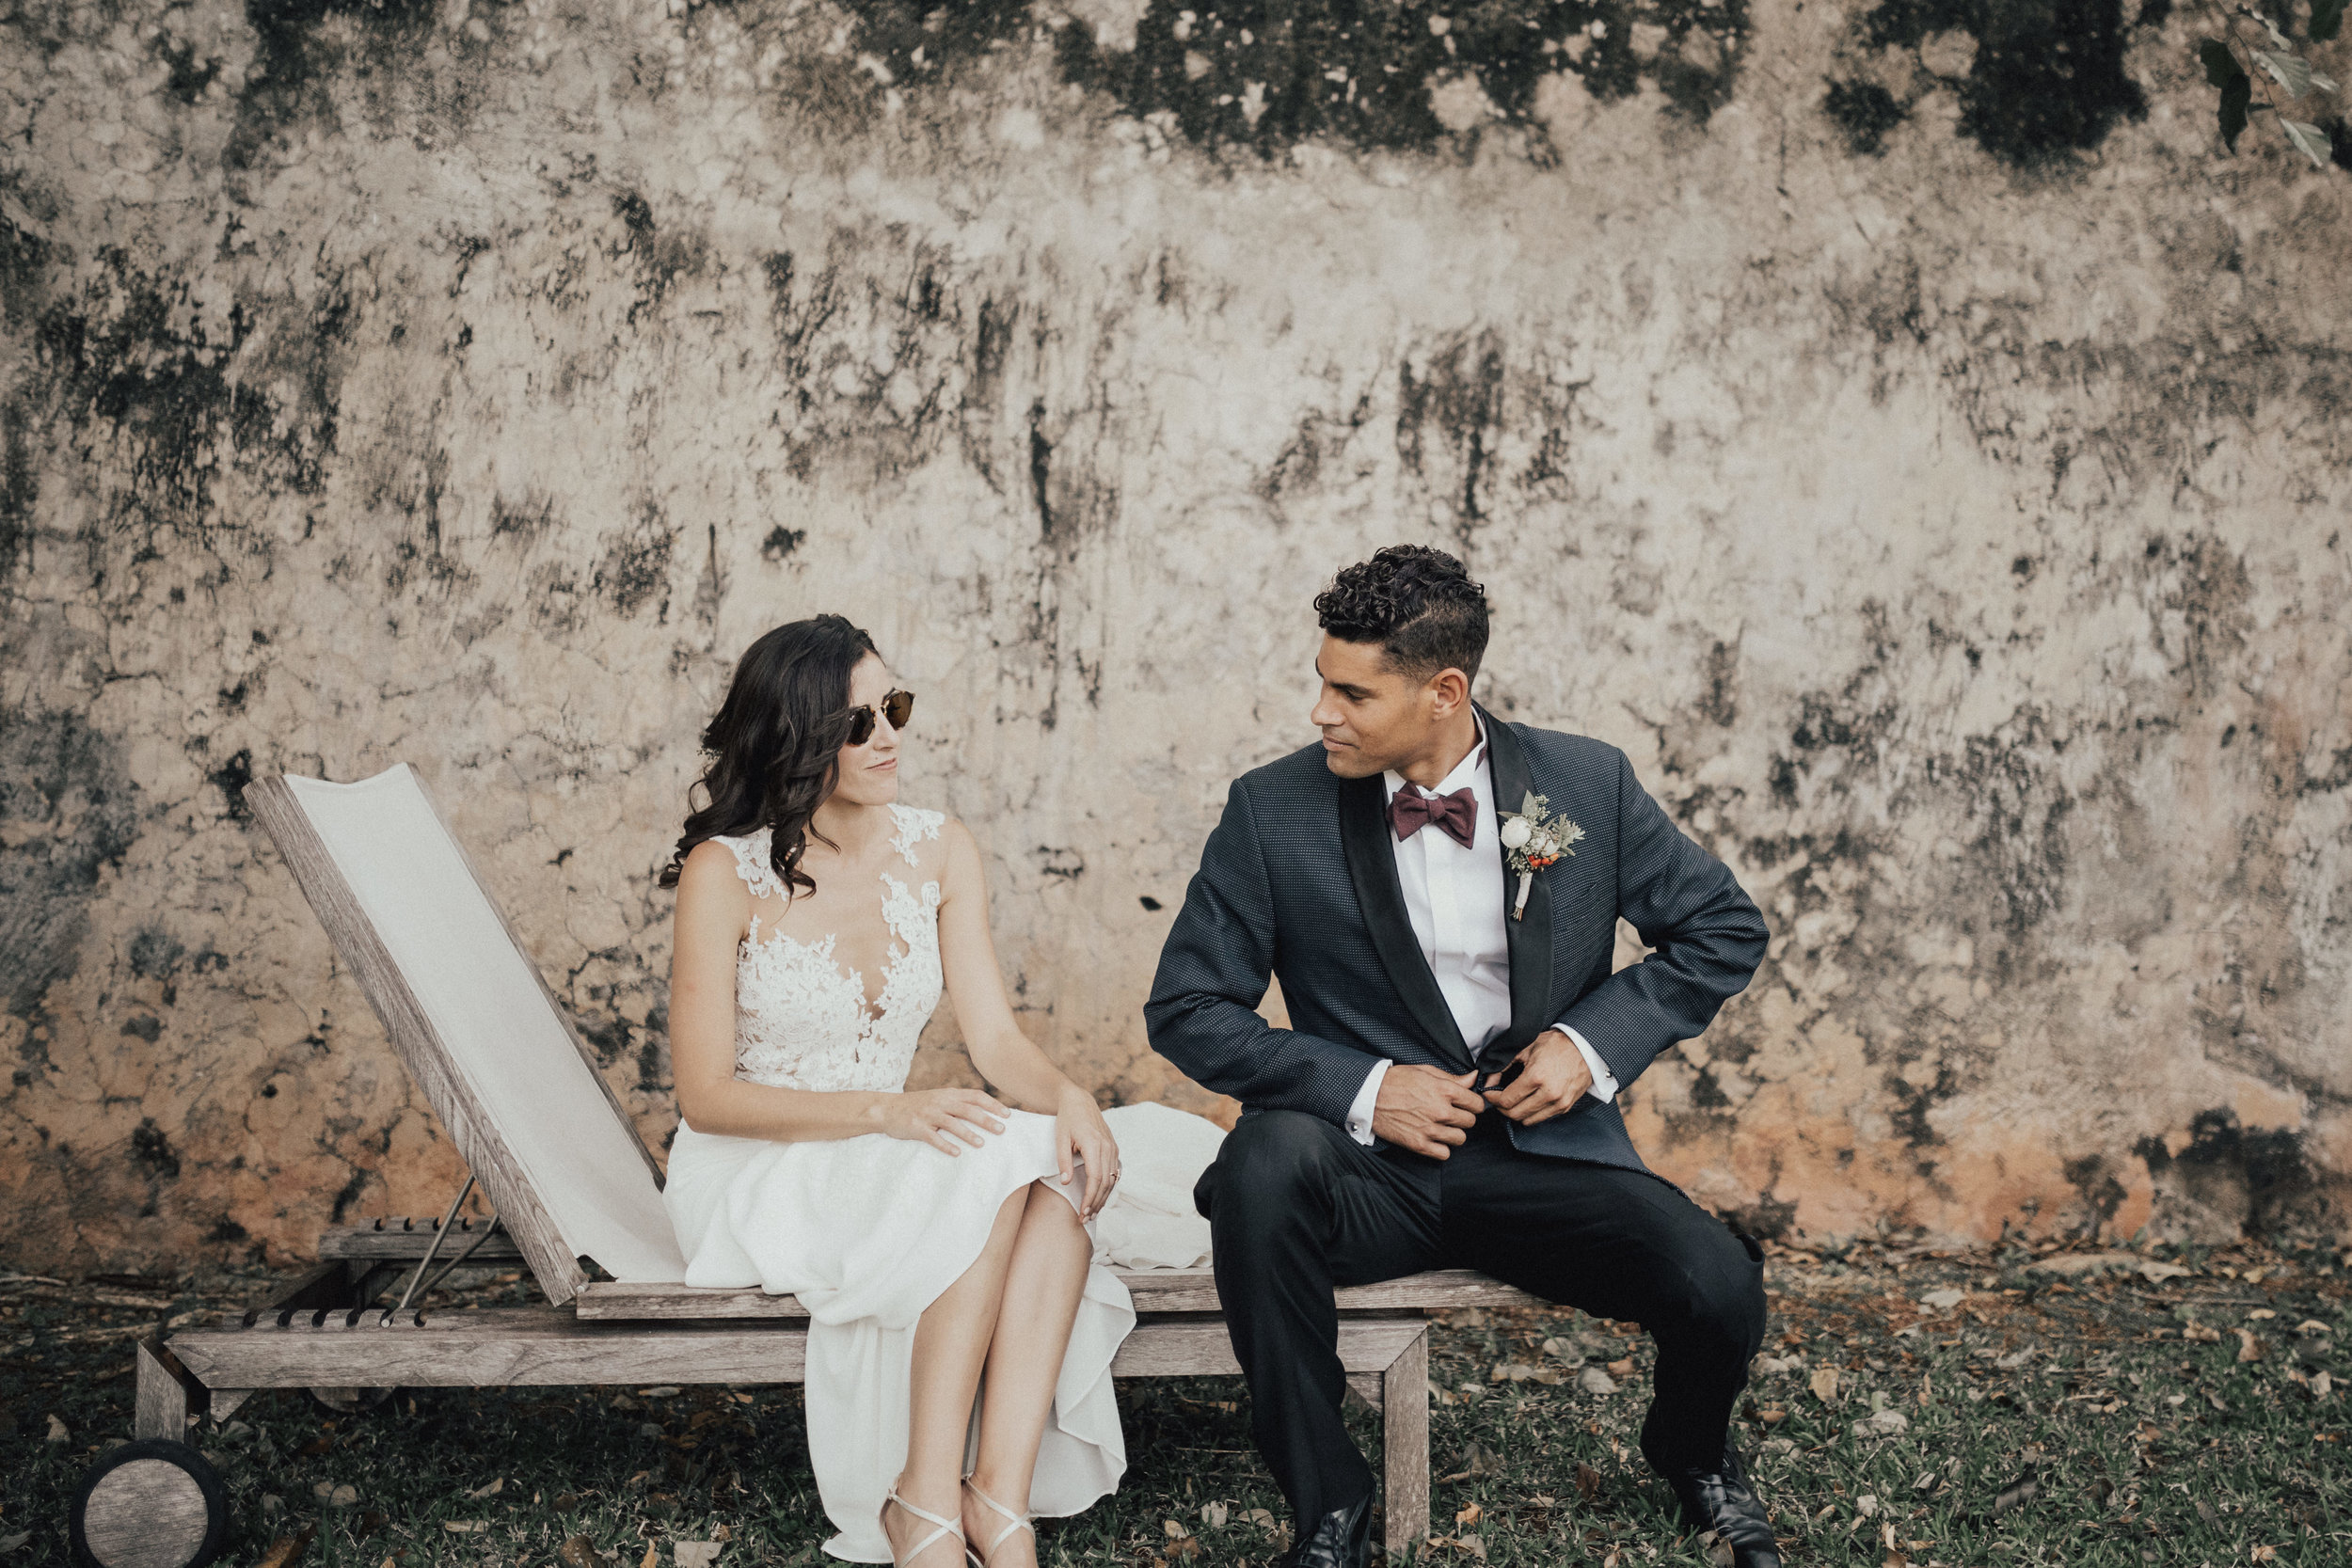 2 first look Tina Kai Merida Mexico Wedding  (78 of 120).jpg